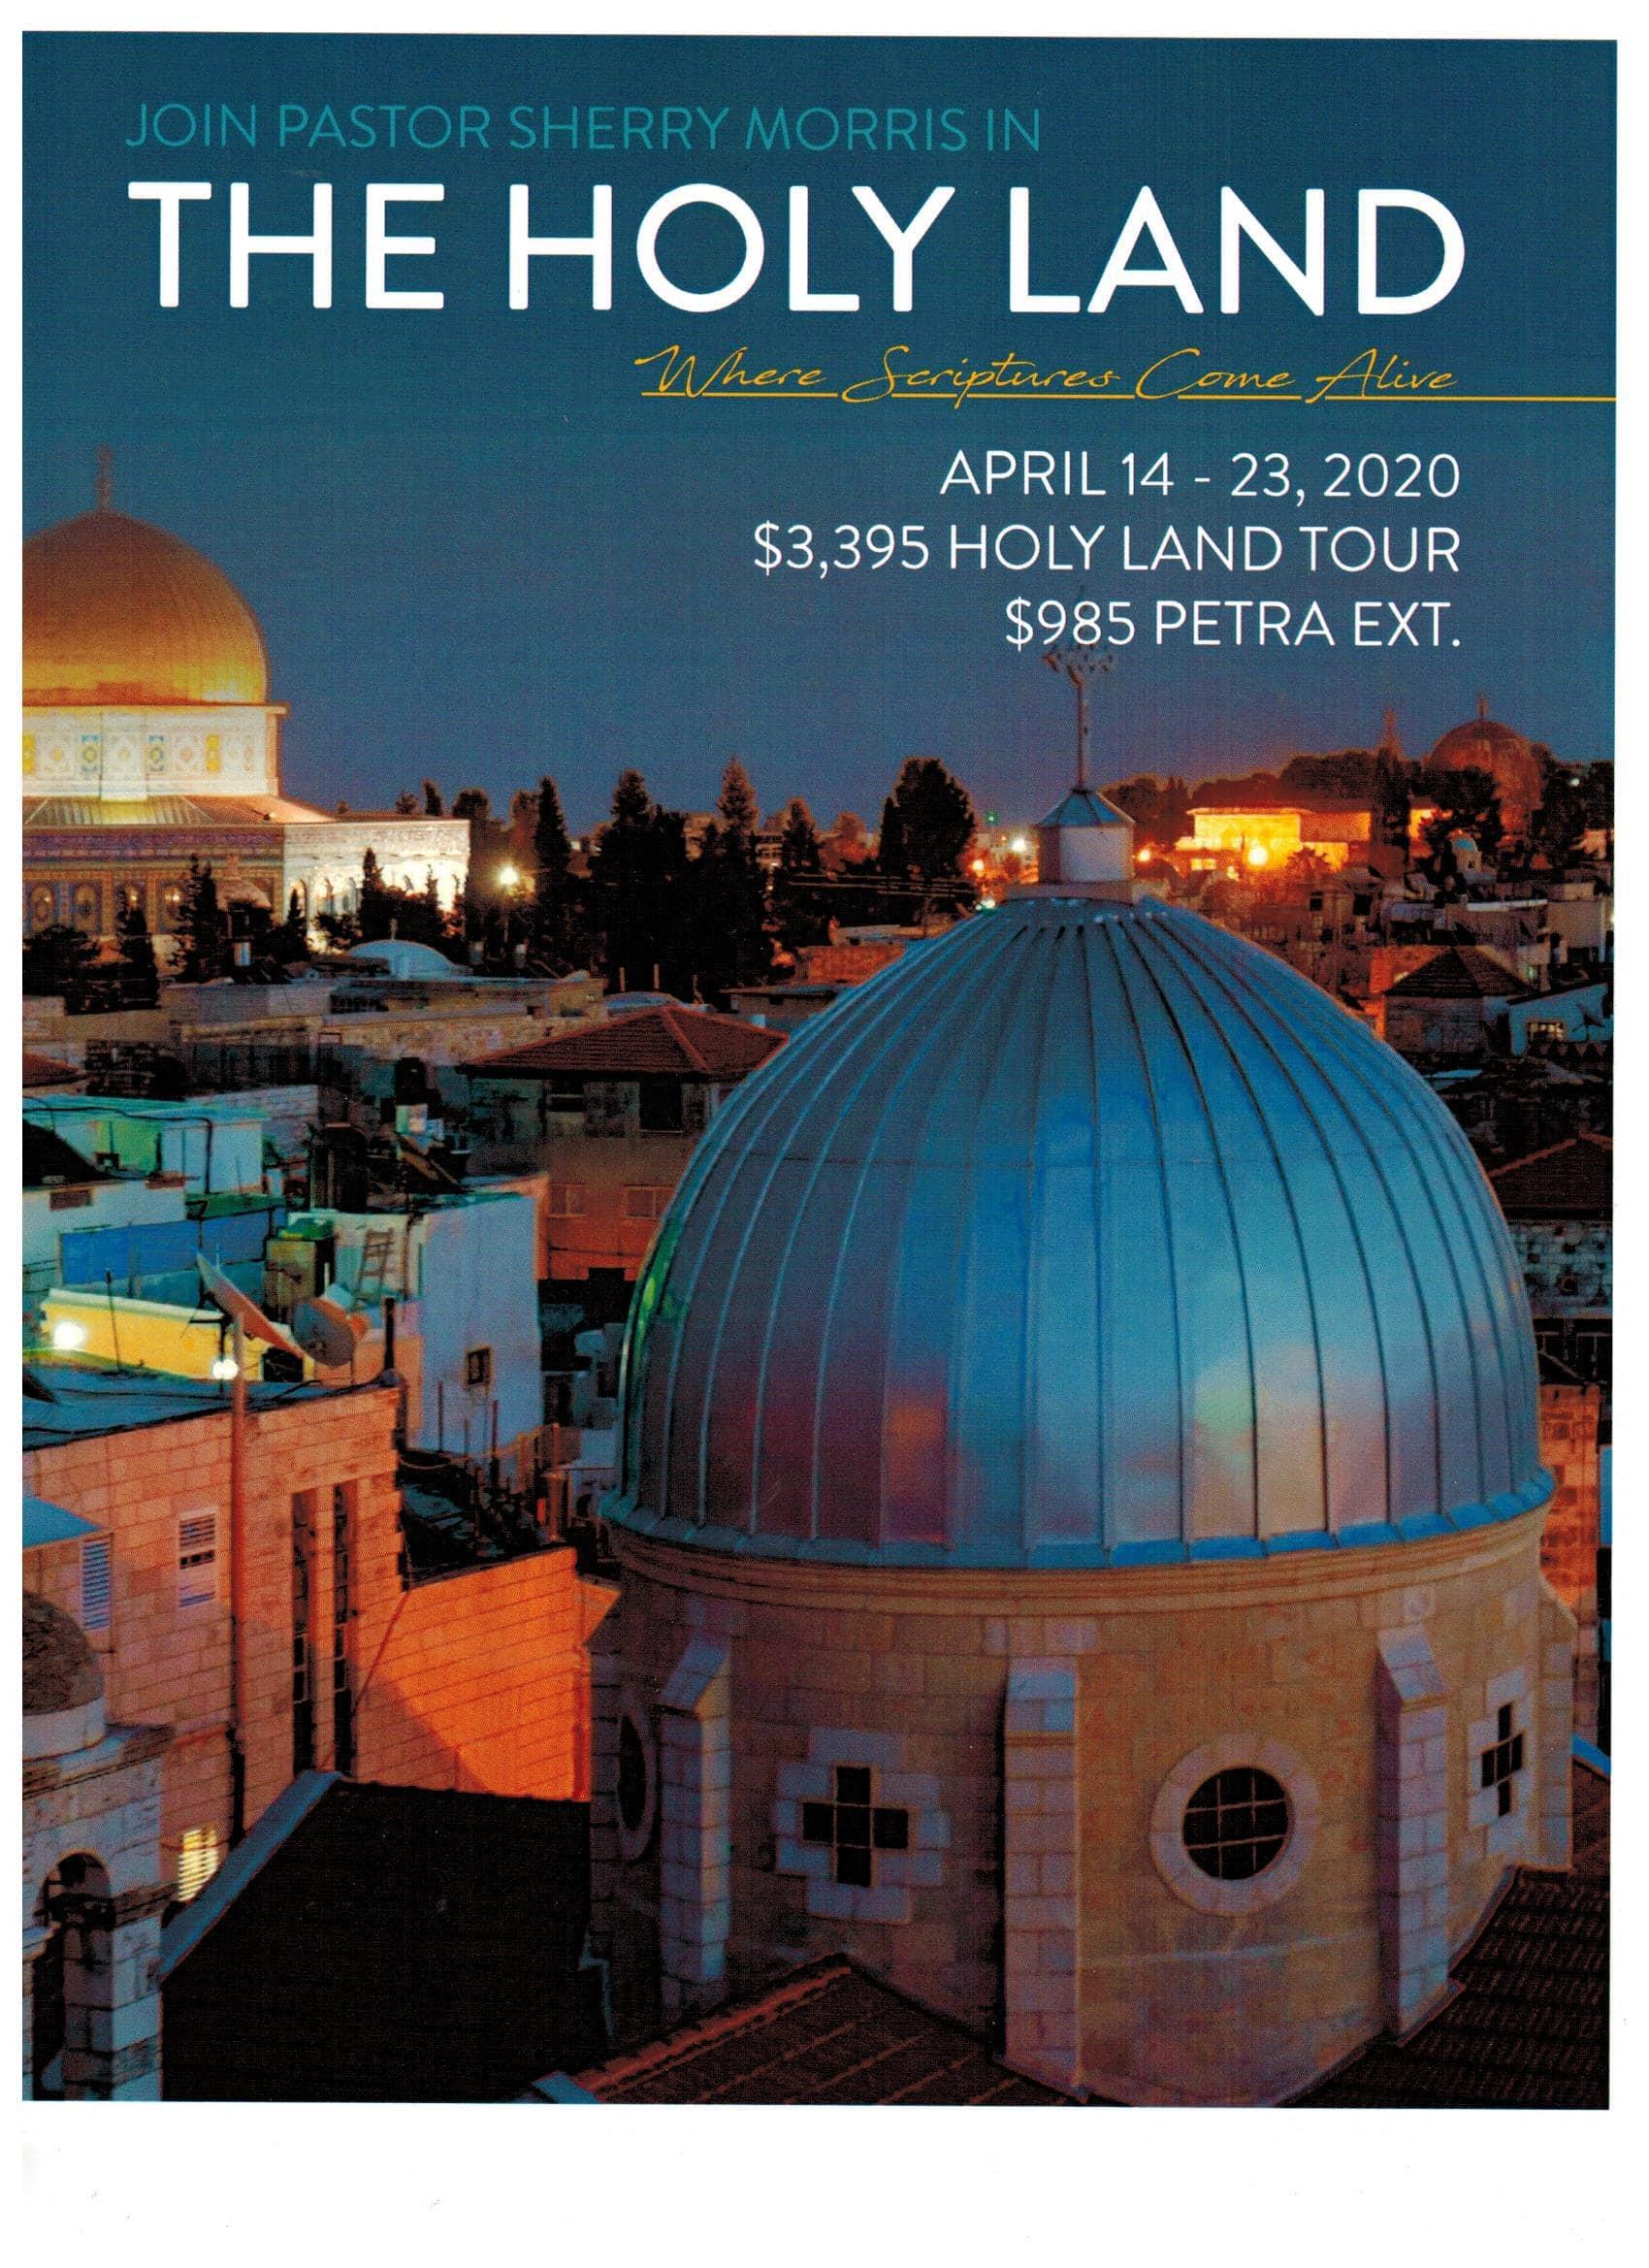 Holy Land Tour 2019 P1 001